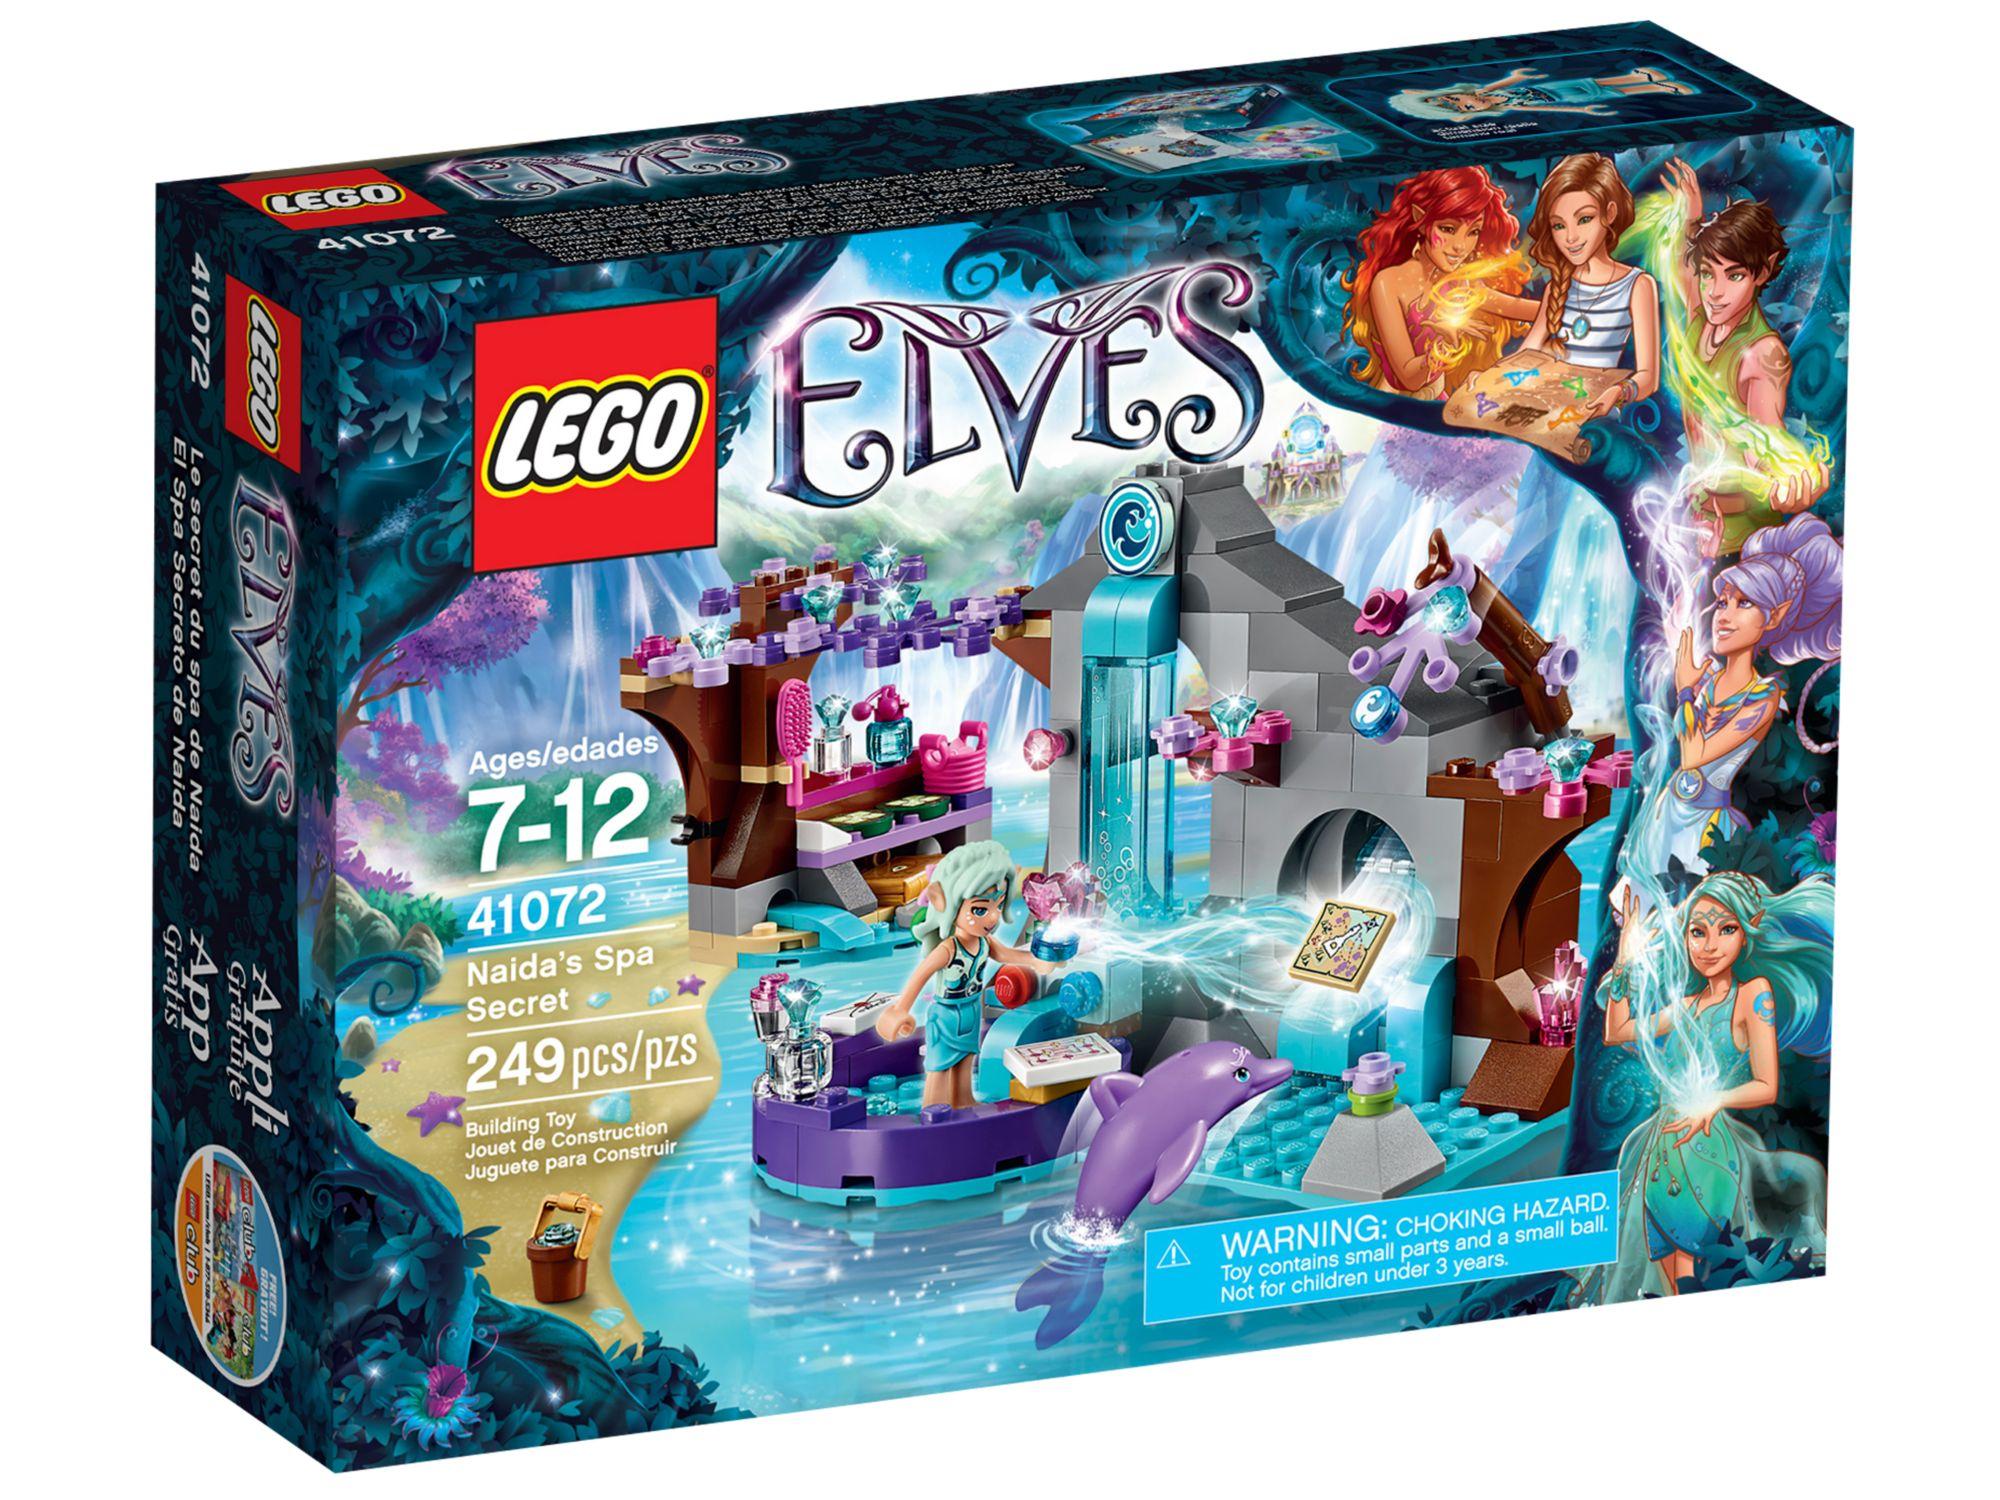 Fabriksnye Review: LEGO Elves 41072 Naida's Spa Secret – Jay's Brick Blog HH-91